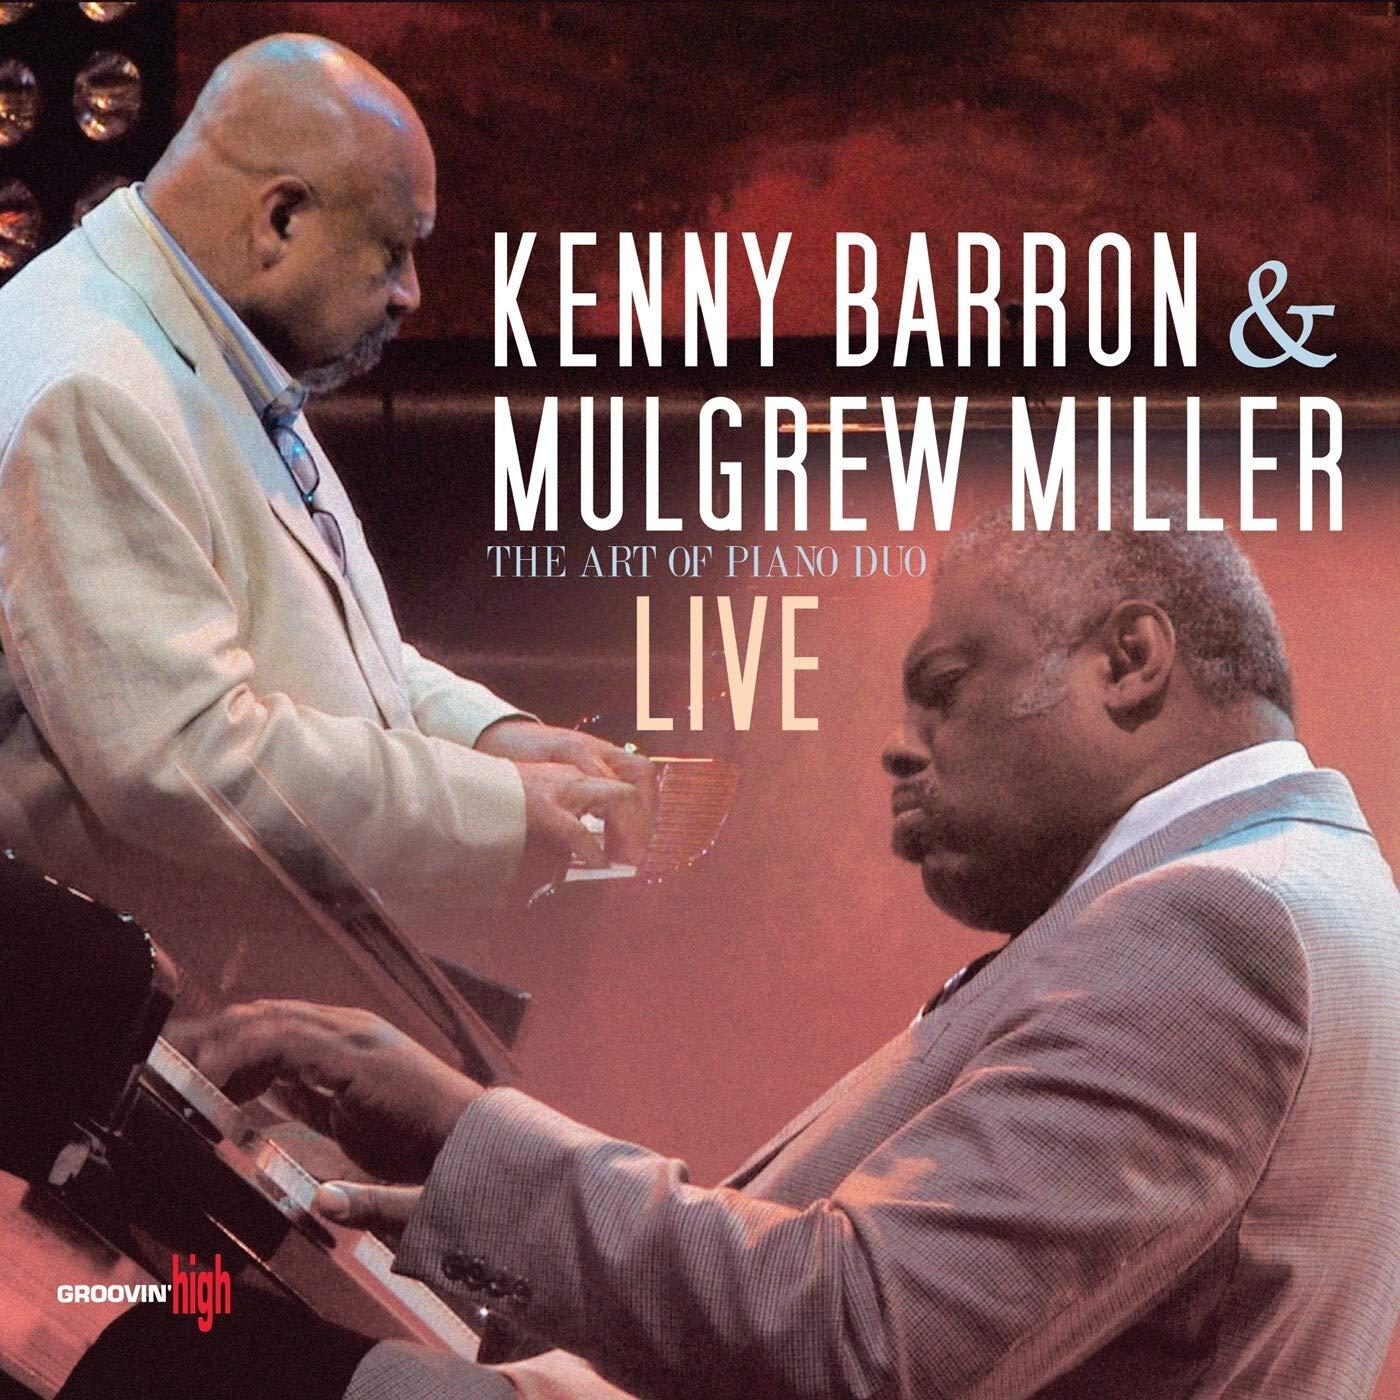 KENNY BARRON - Kenny Barron & Mulgrew Miller : The Art of Piano Duo Live cover